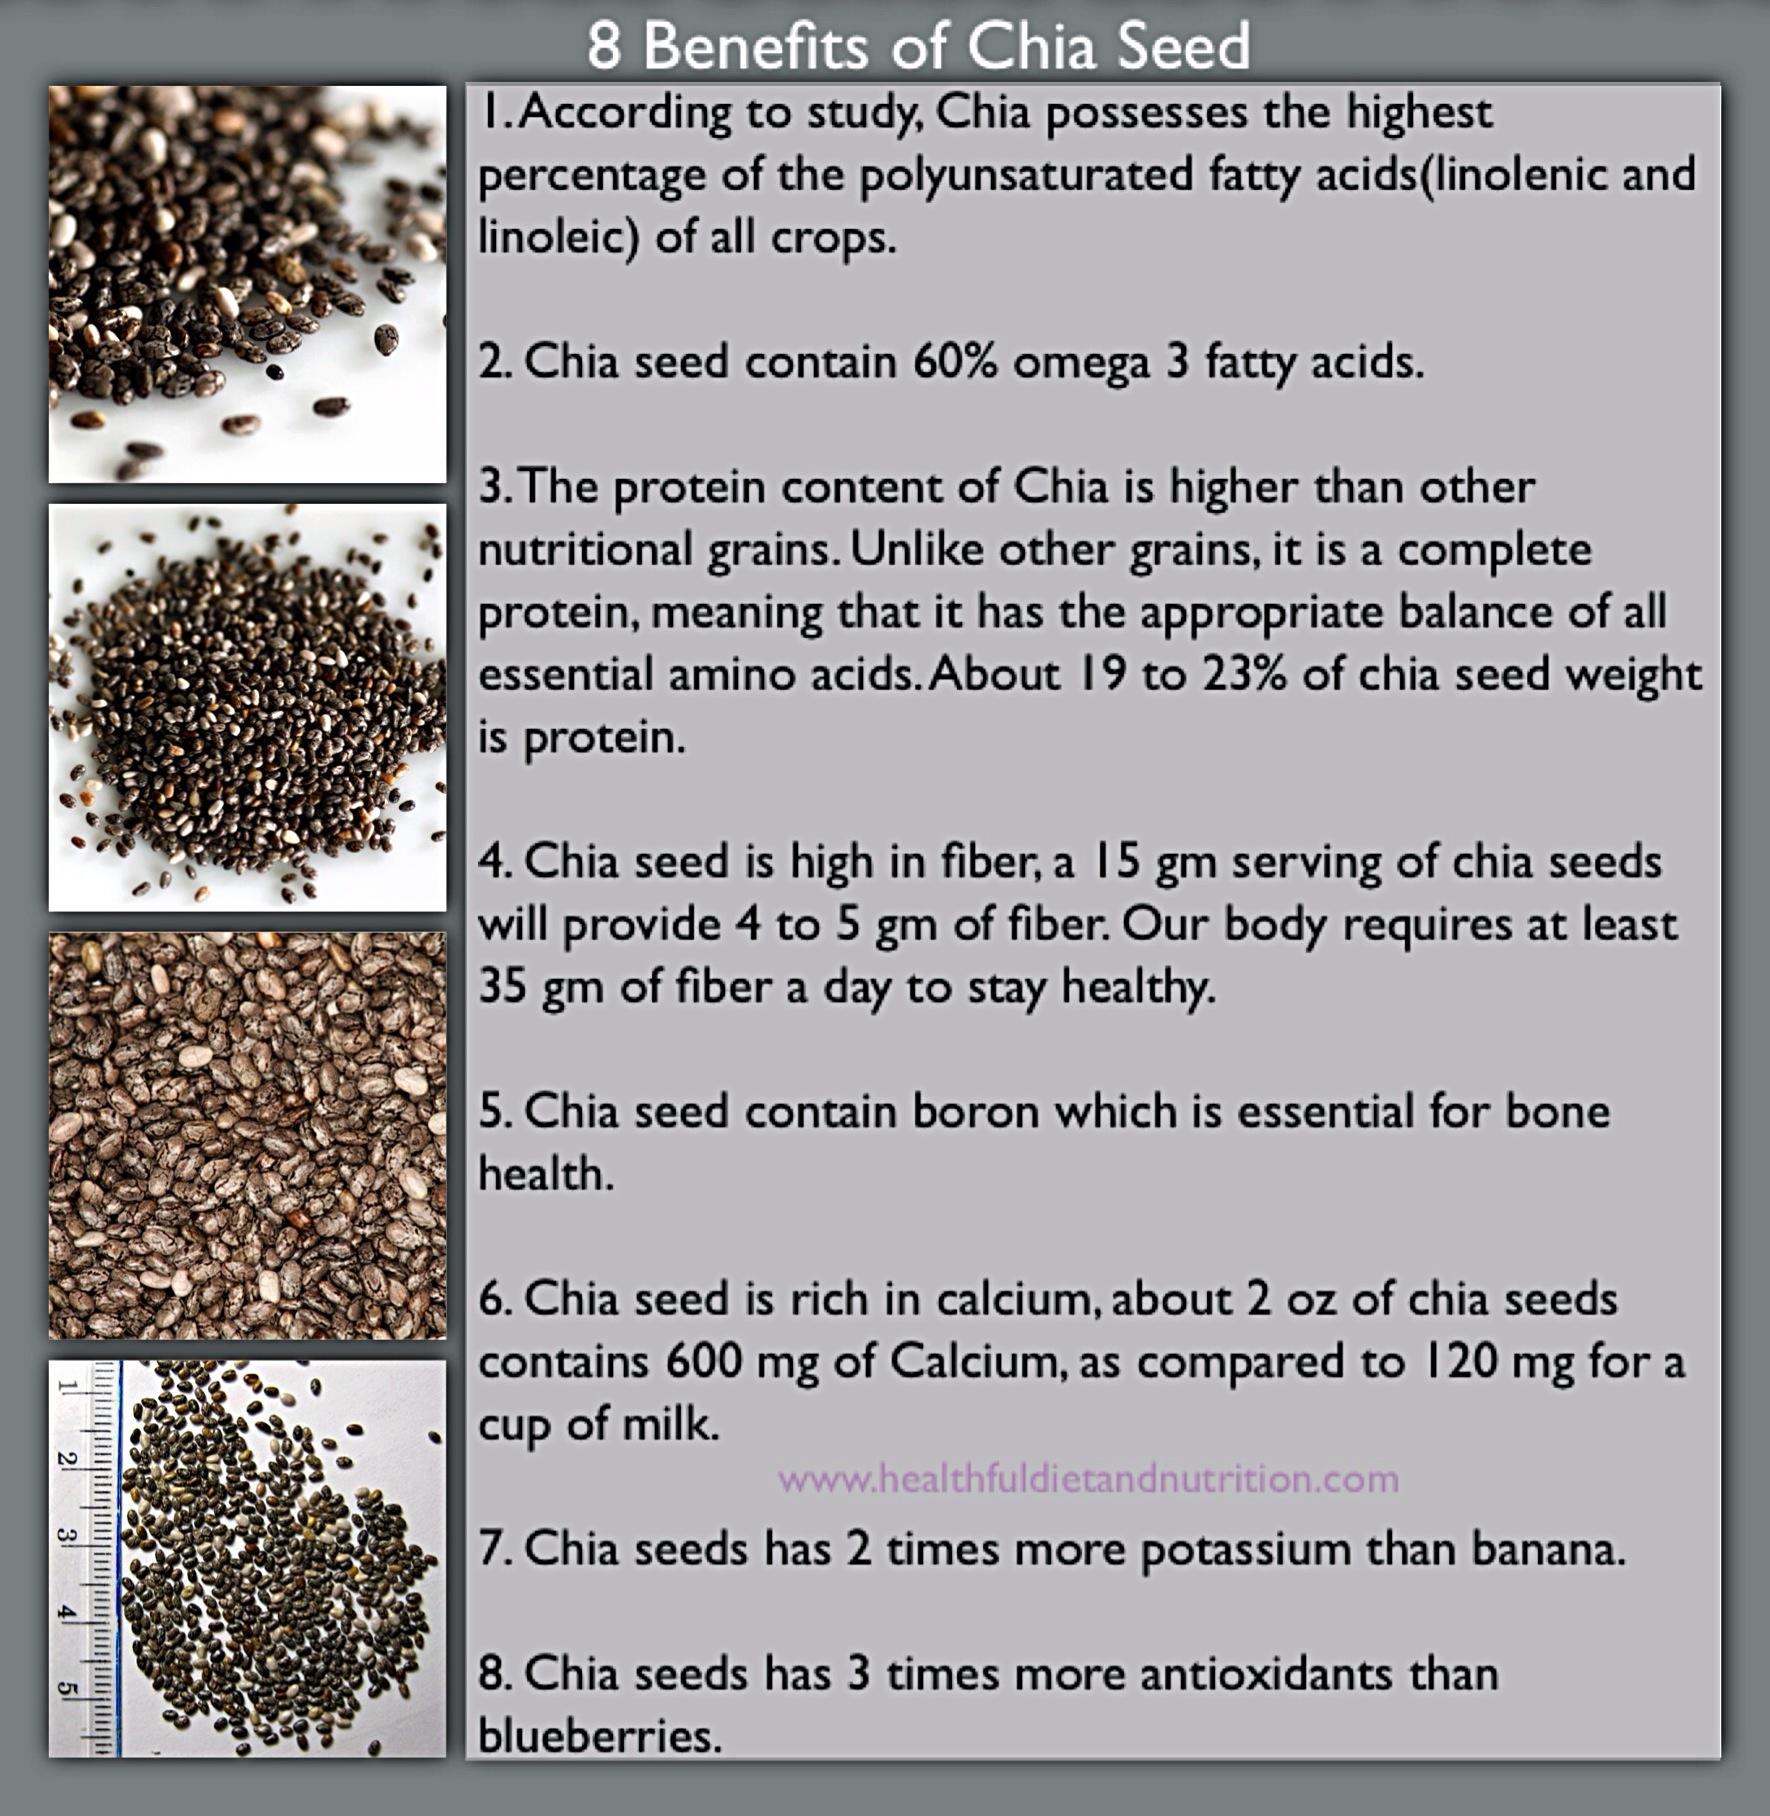 8 Health Benefits of Chia Seed